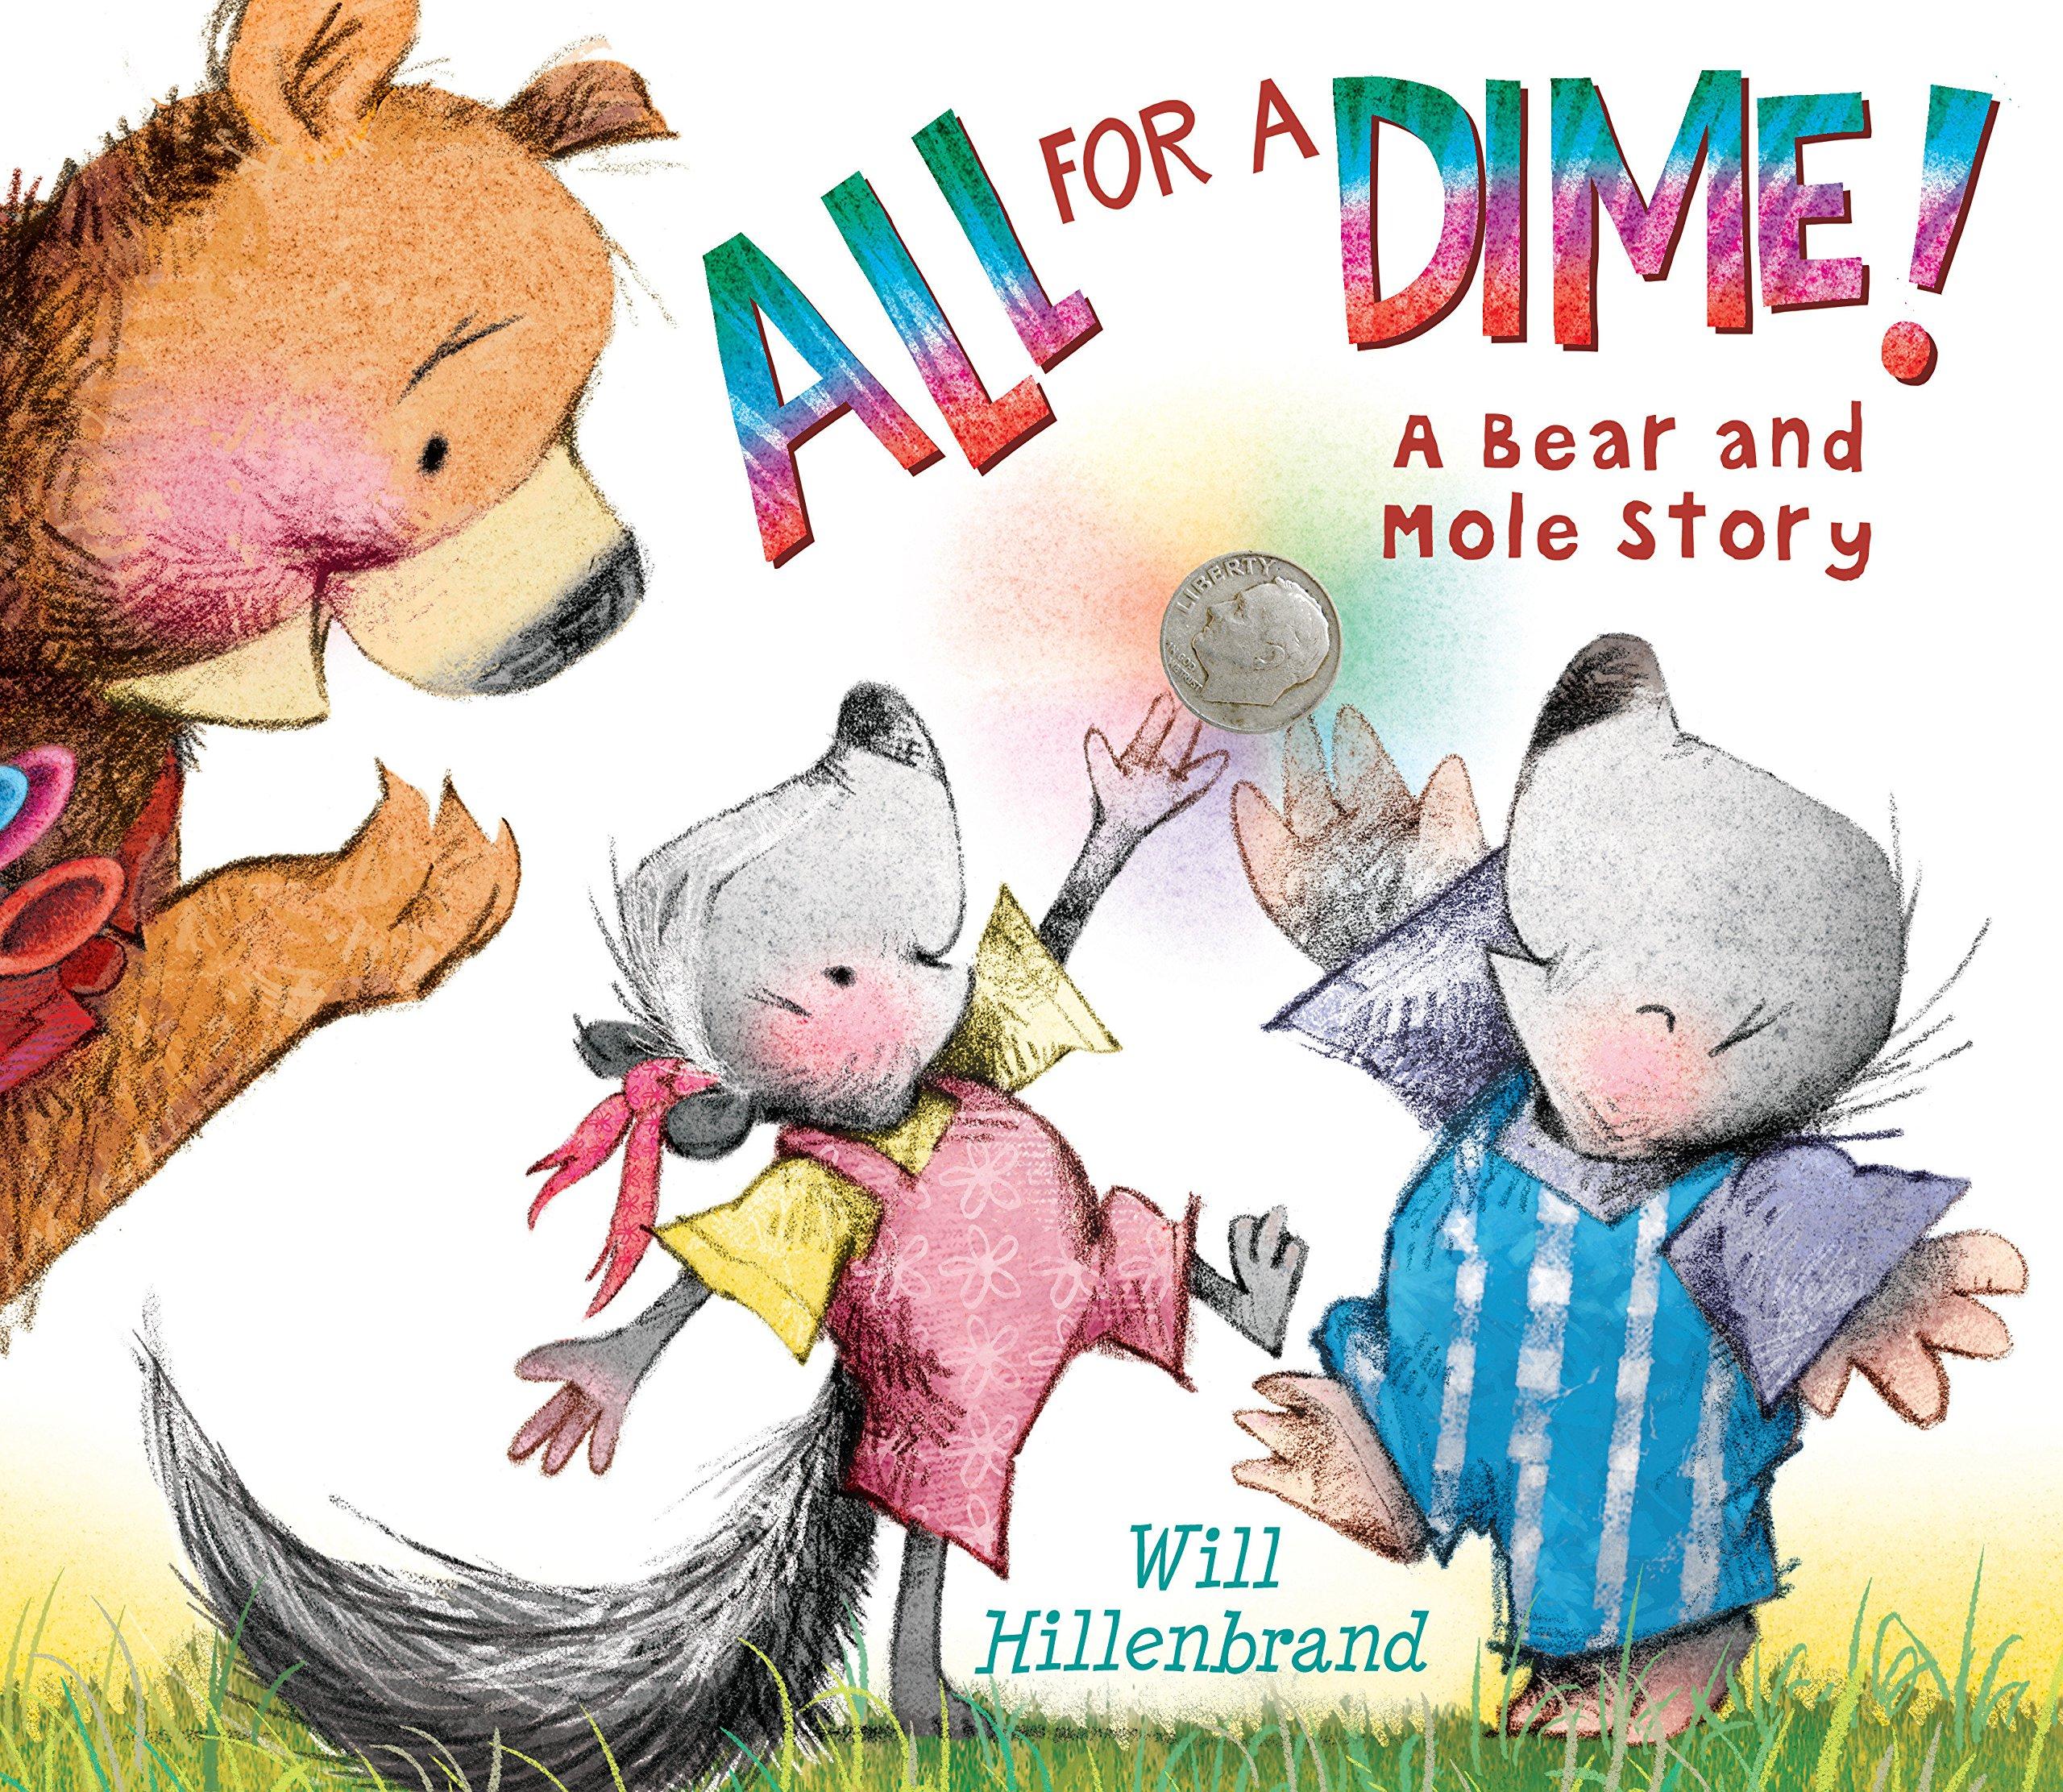 ... 63b5e 1afe5 A Bear and Mole Story Will Hillenbrand 9780823429462  Amazon.com Books exclusive deals ... 1bd47e49ec